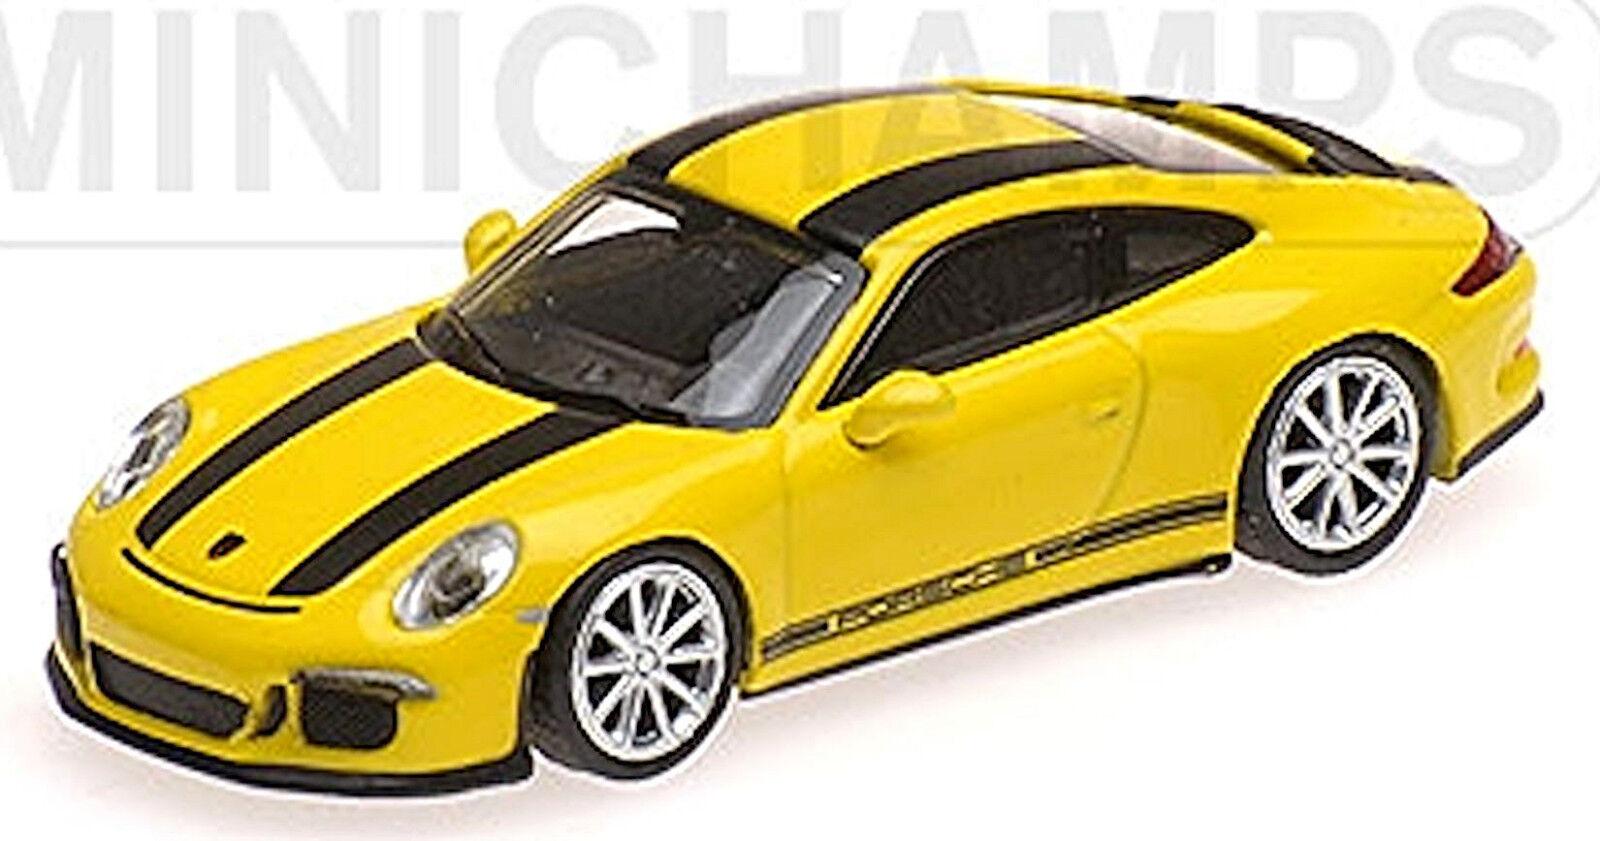 Porsche 911 R Coup 65533; [livräddande] 65533; 2016 gul svkonst Stripe 1 87 Minichamps